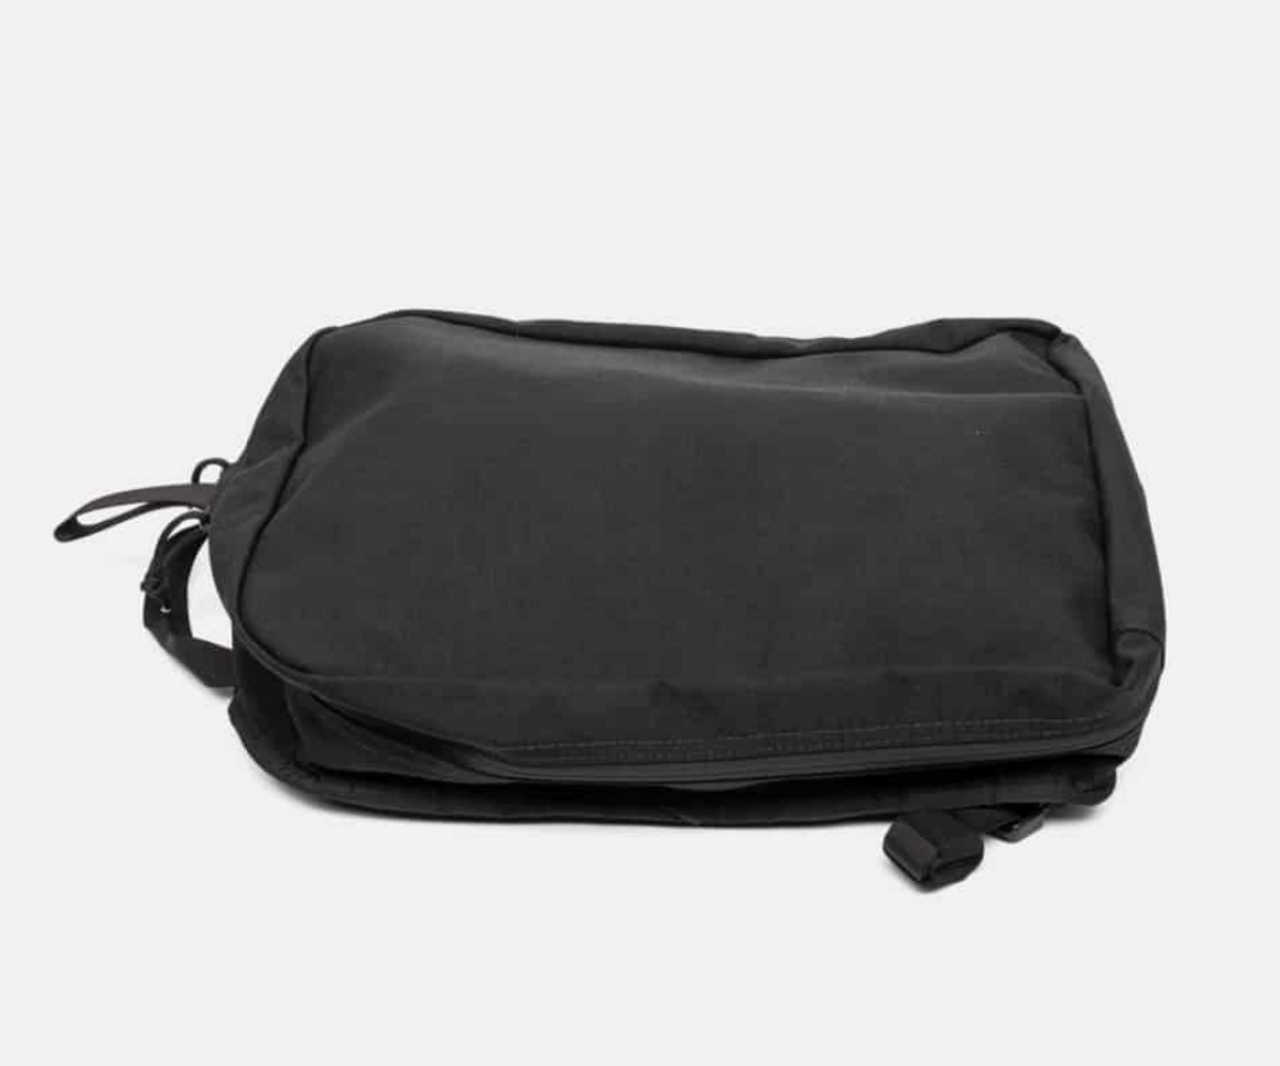 MCK BSB Ballistic Sling Bag